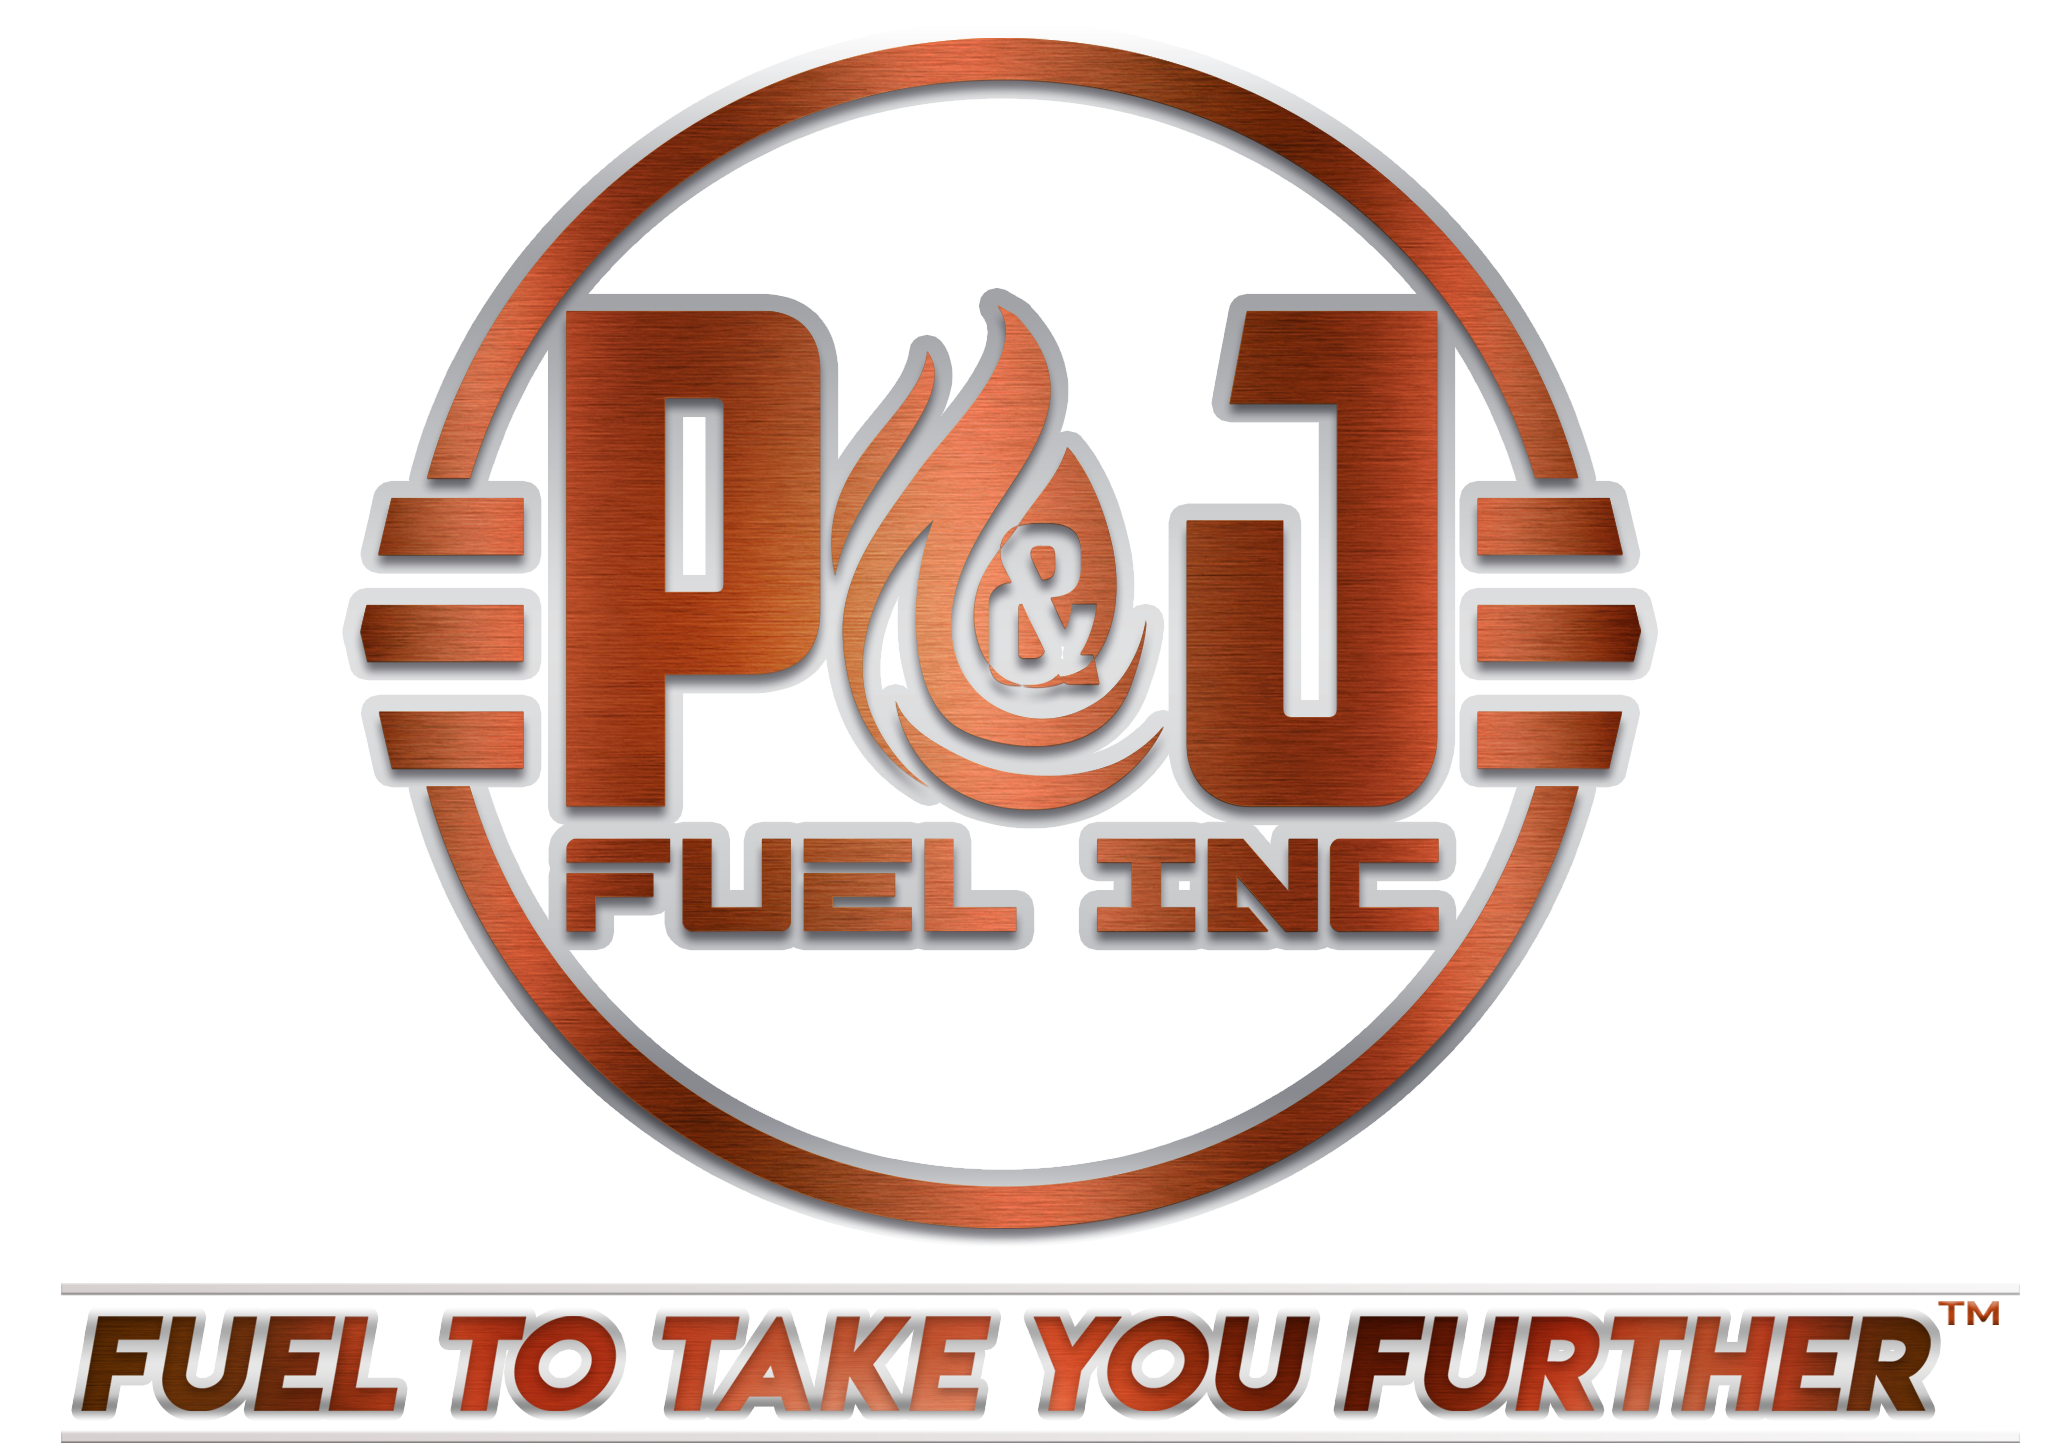 P&J Fuel